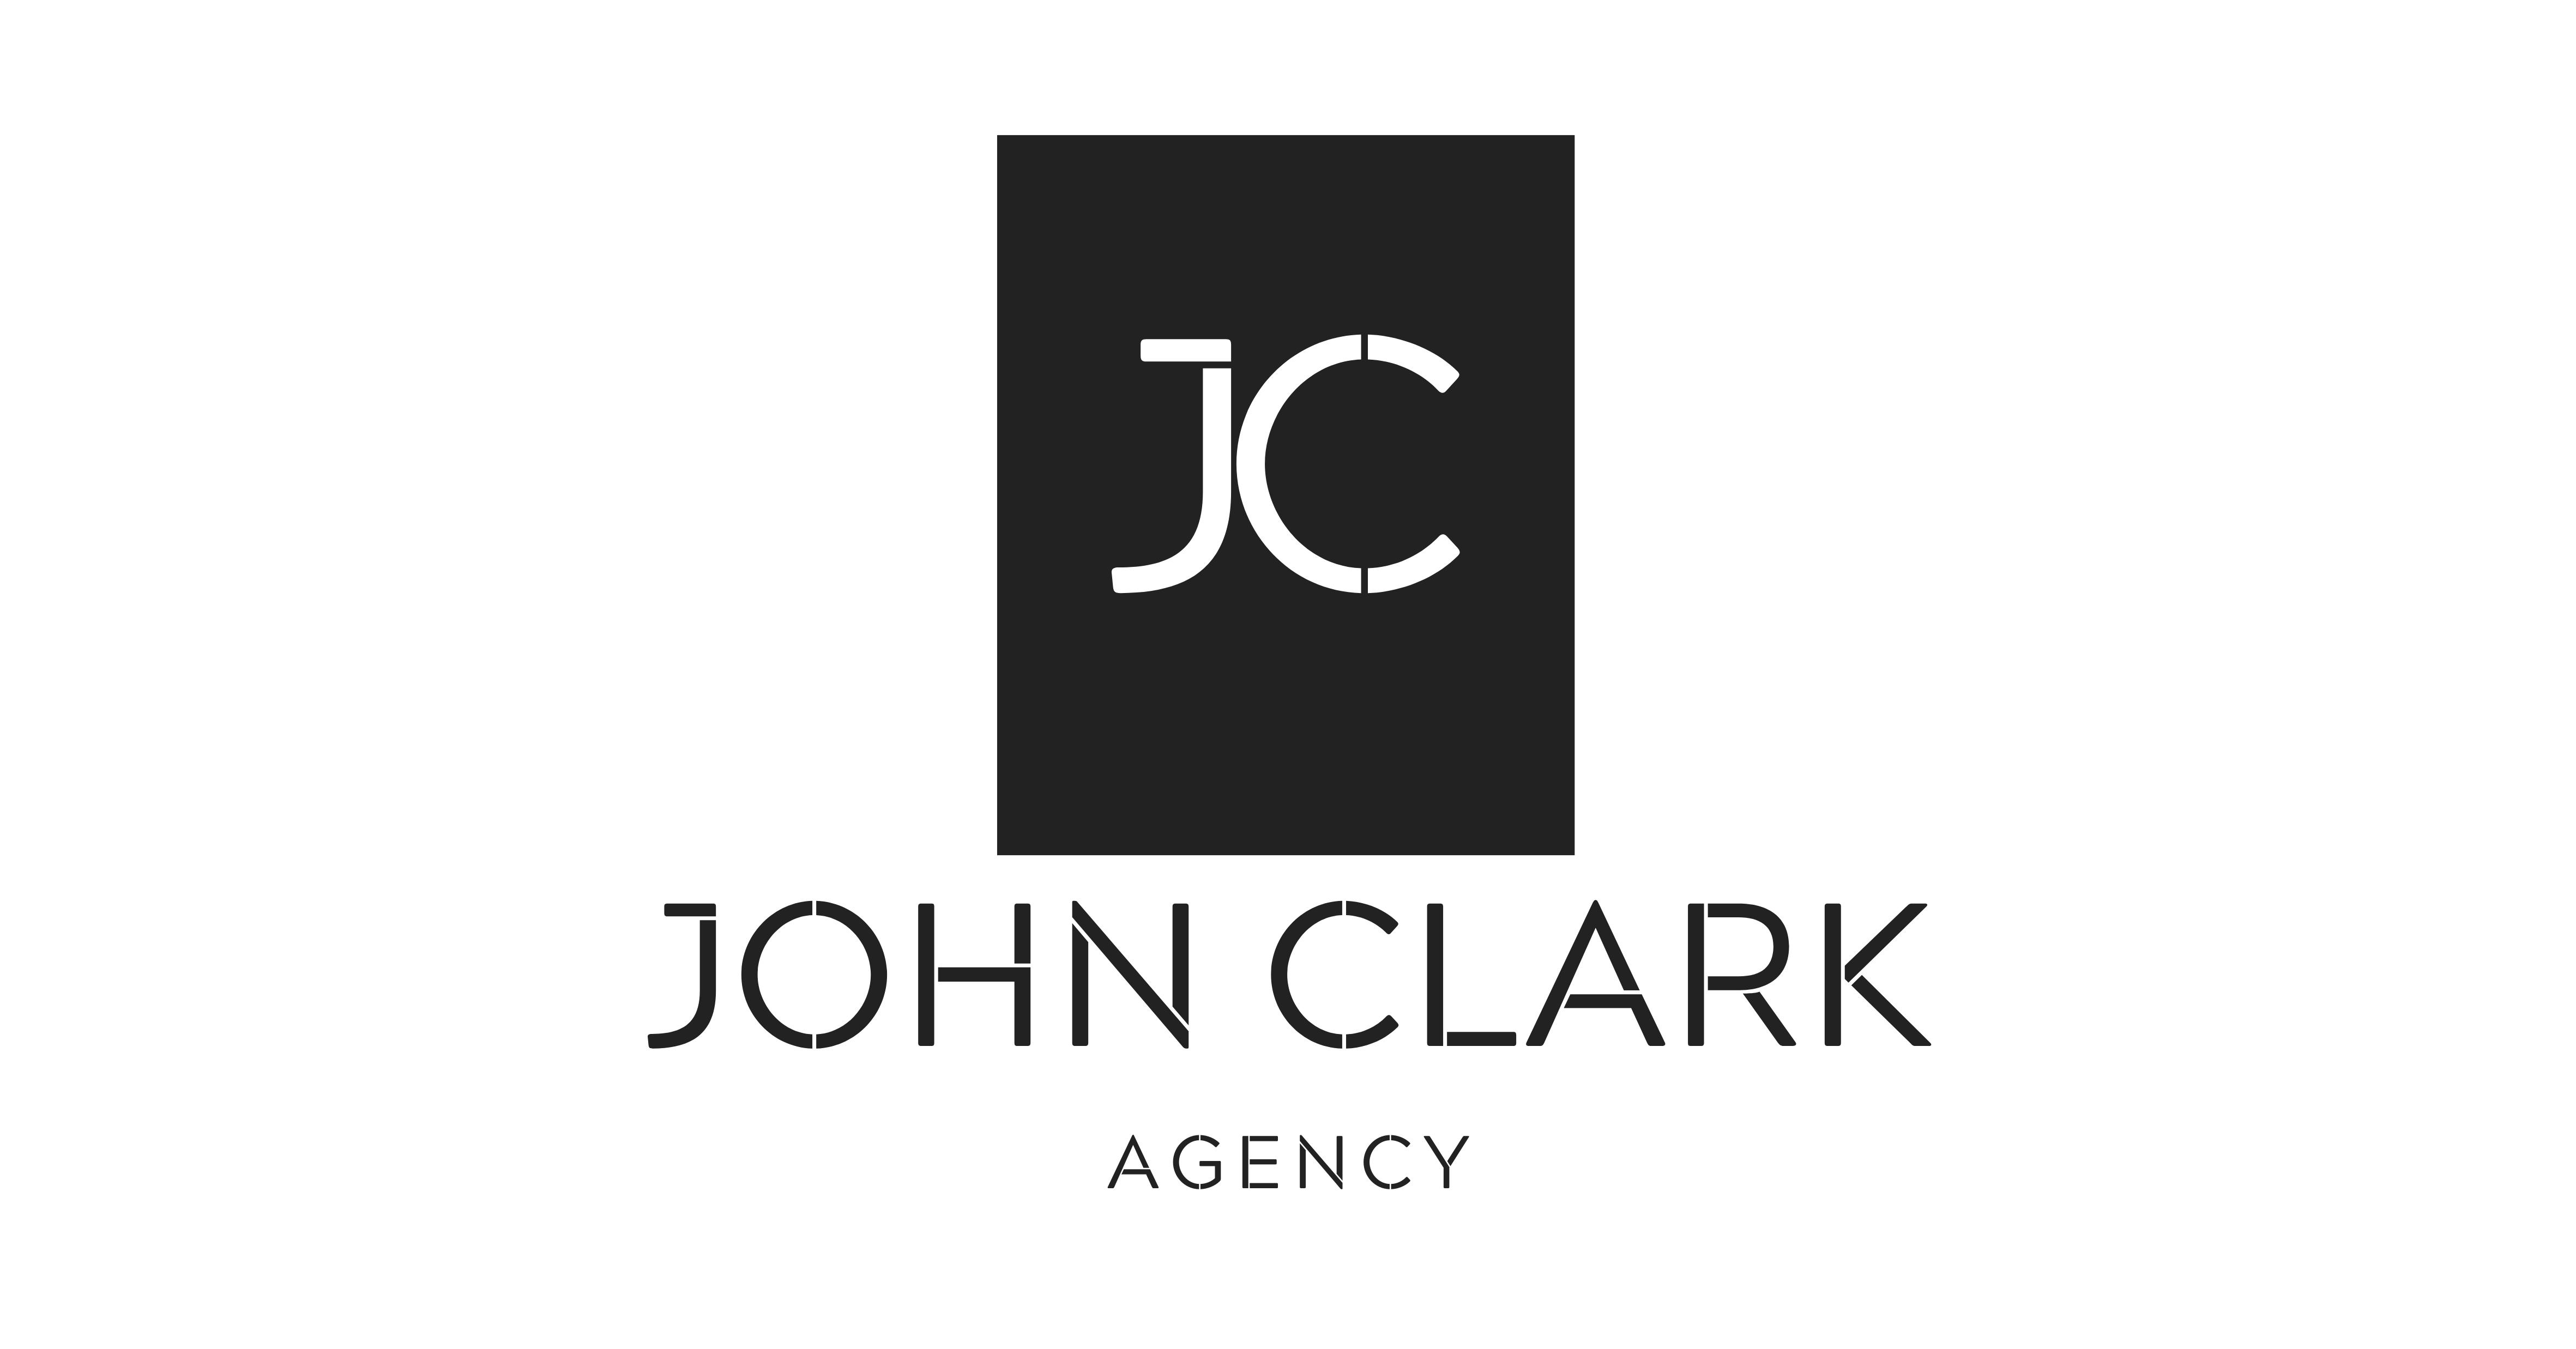 John Clark Agency